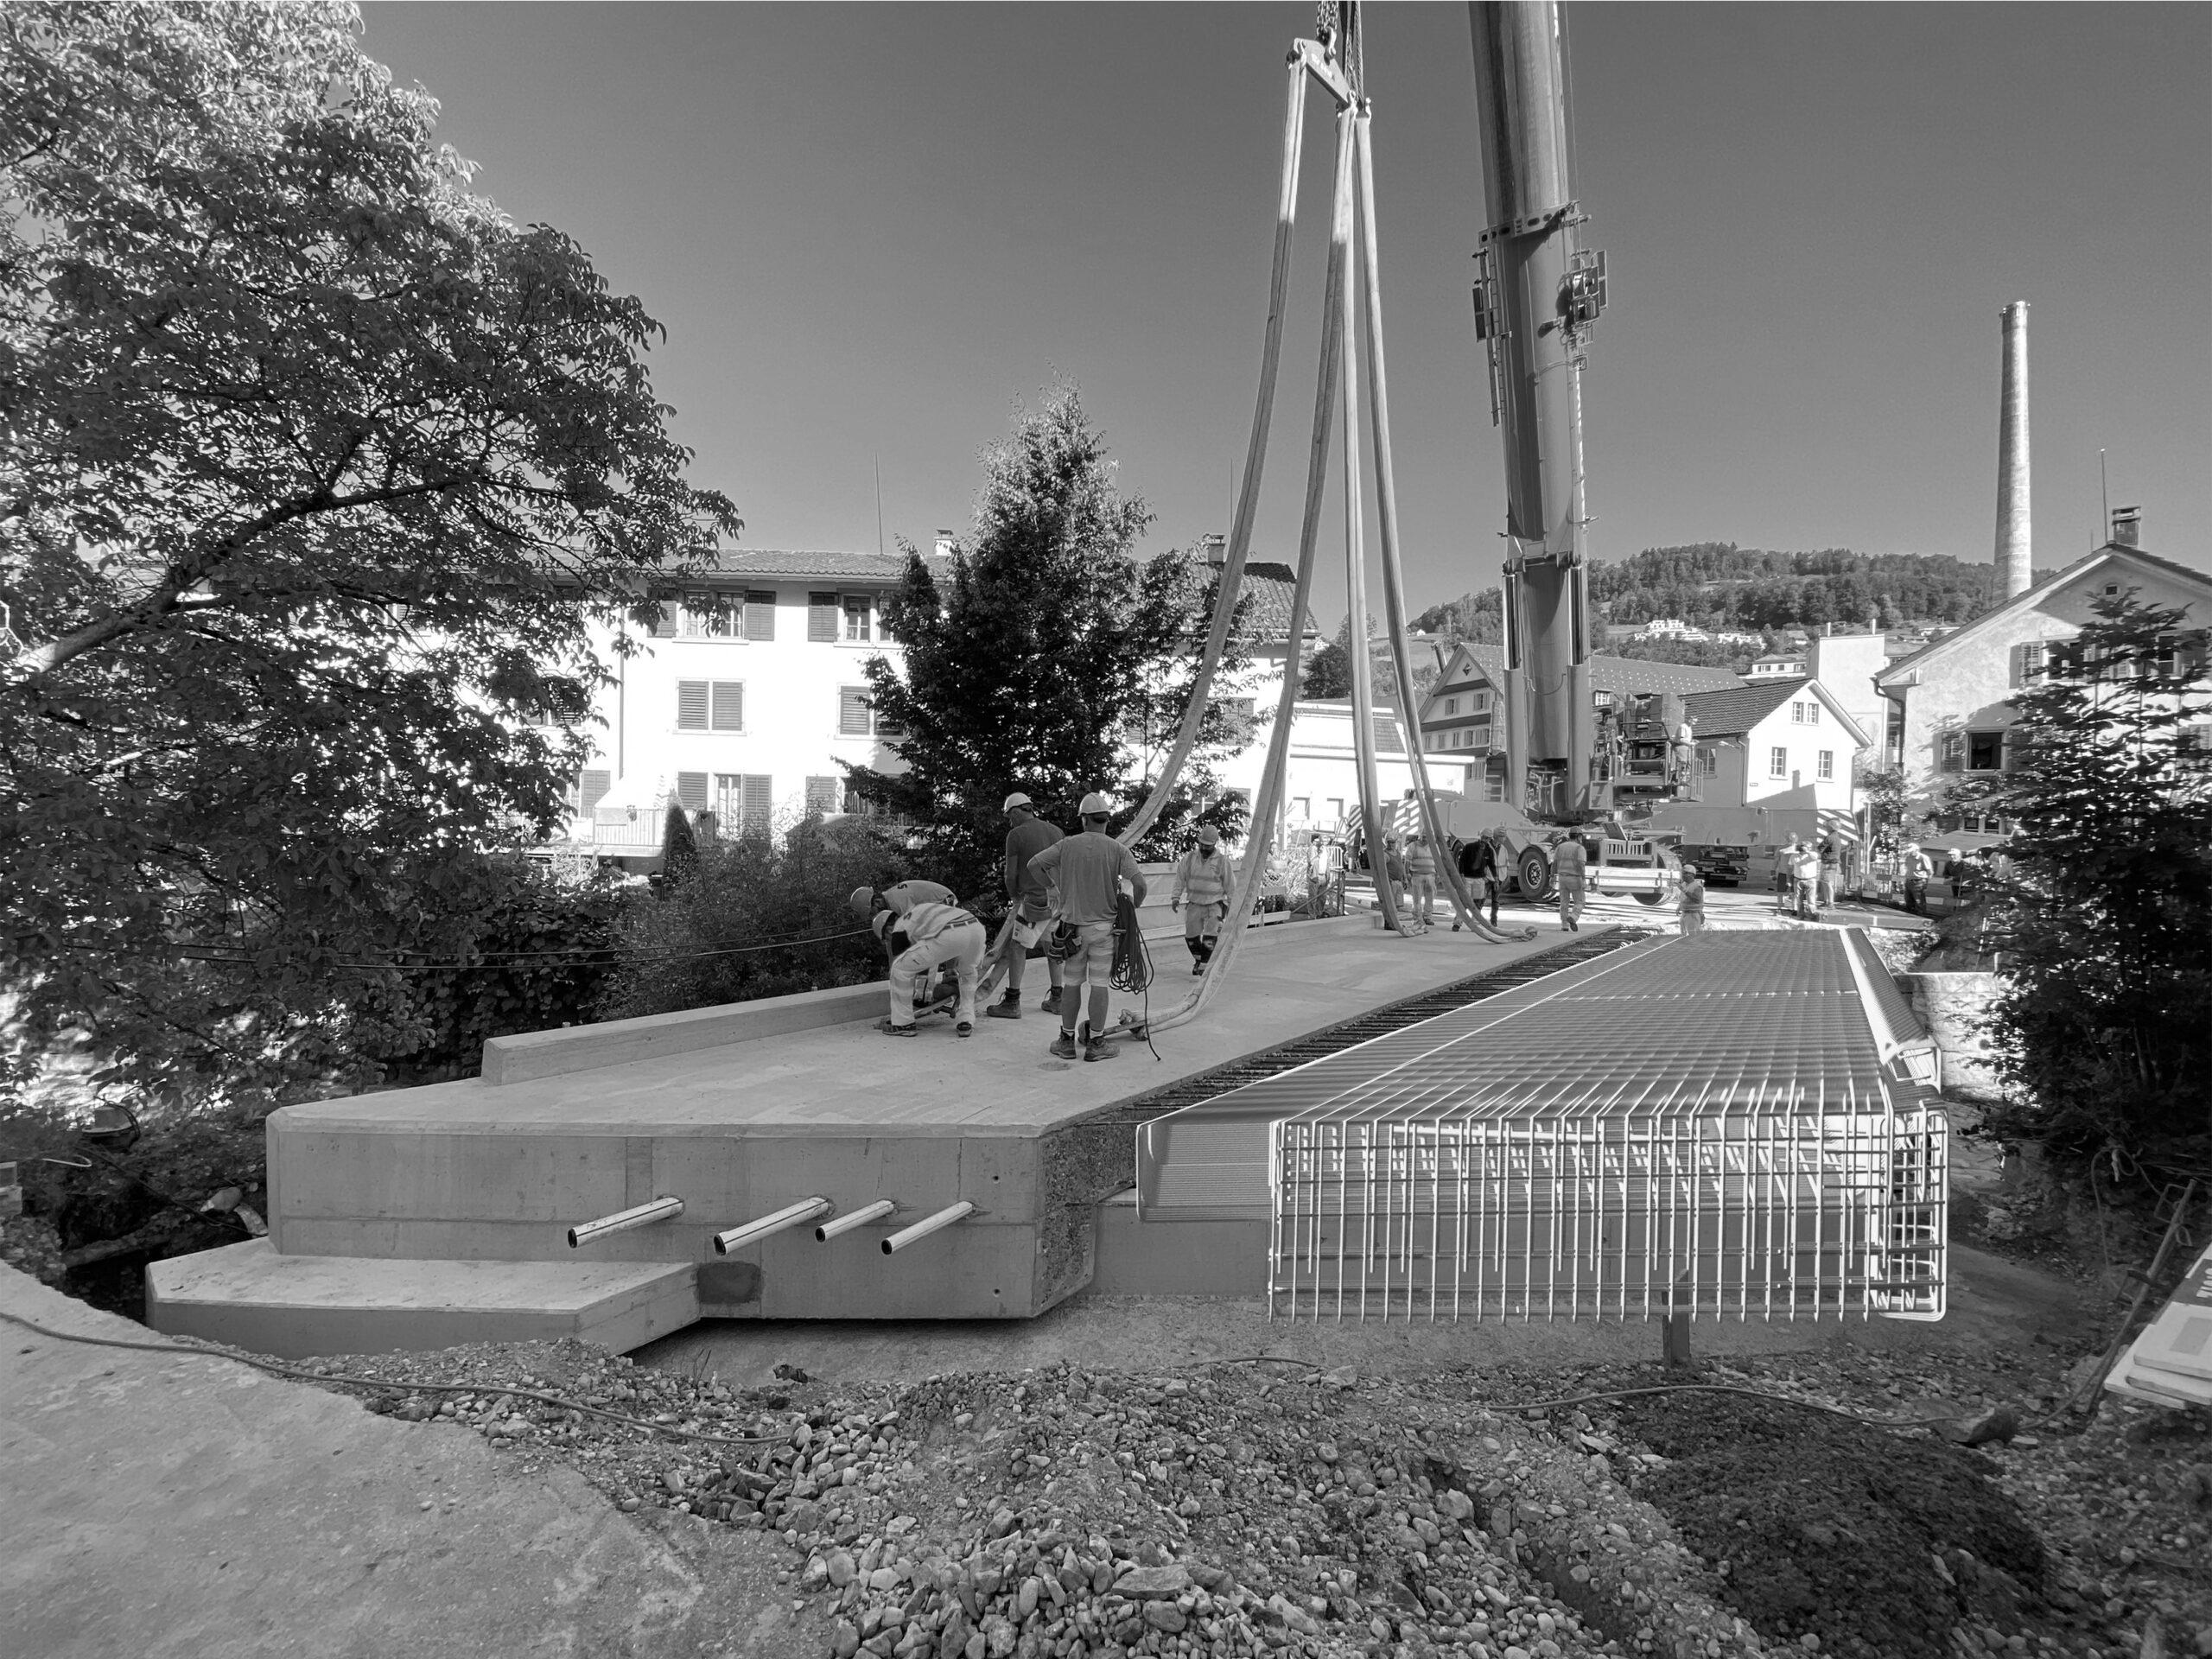 https://aschwanden-partner.ch/wp-content/uploads/2020/12/Fotorealitaet-Bruecke-Wald_2020-07-29-2-scaled.jpg